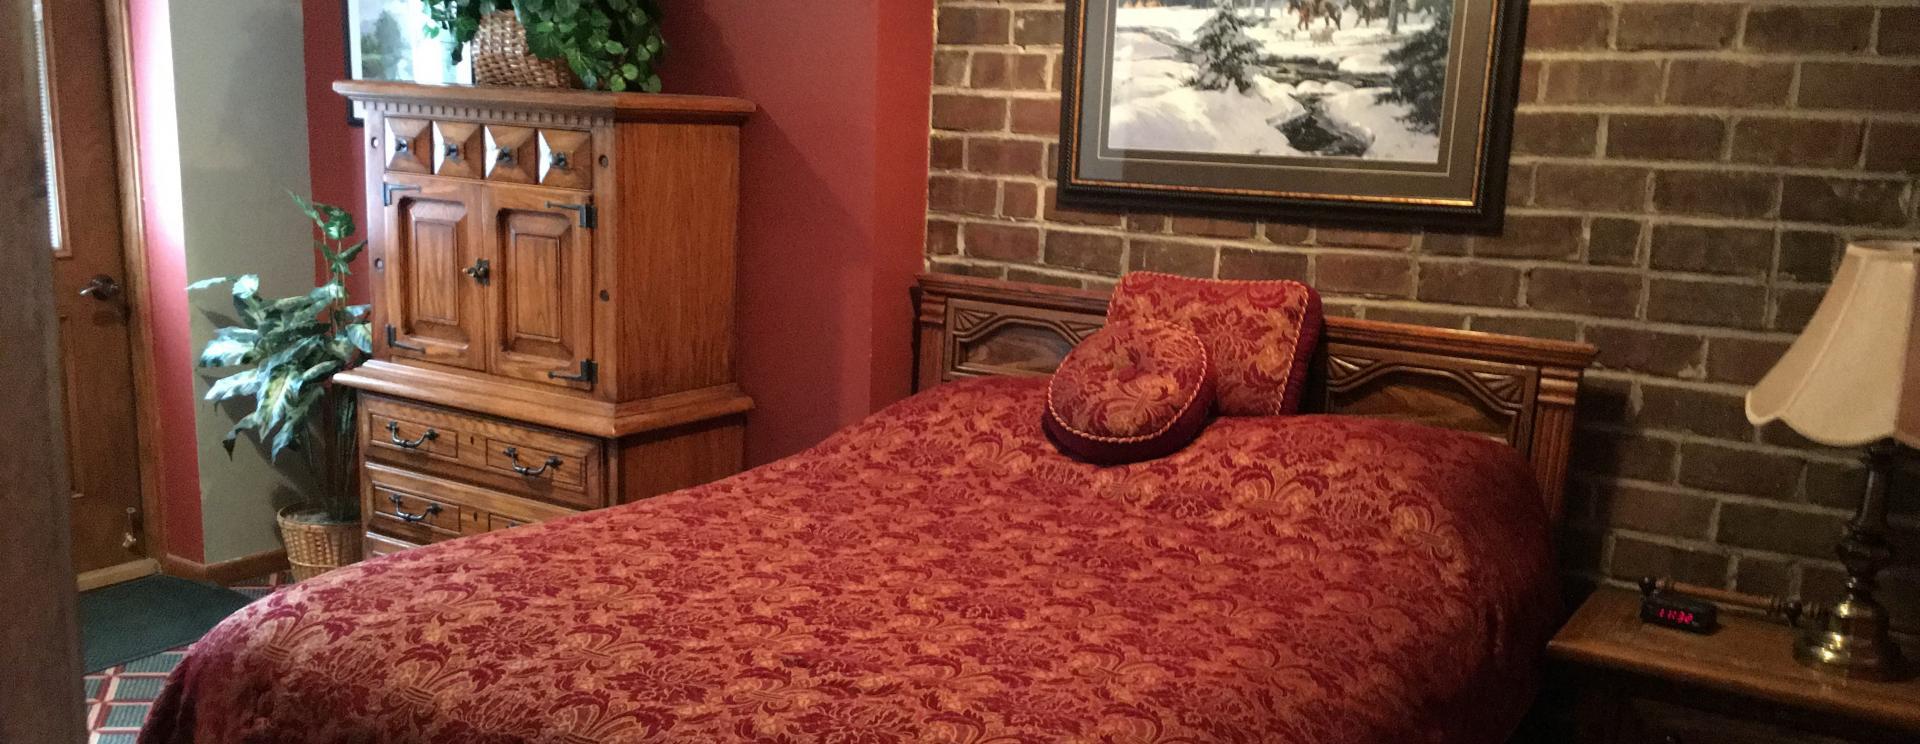 Butch Cassidy & Sundance Kid Luxury Suites